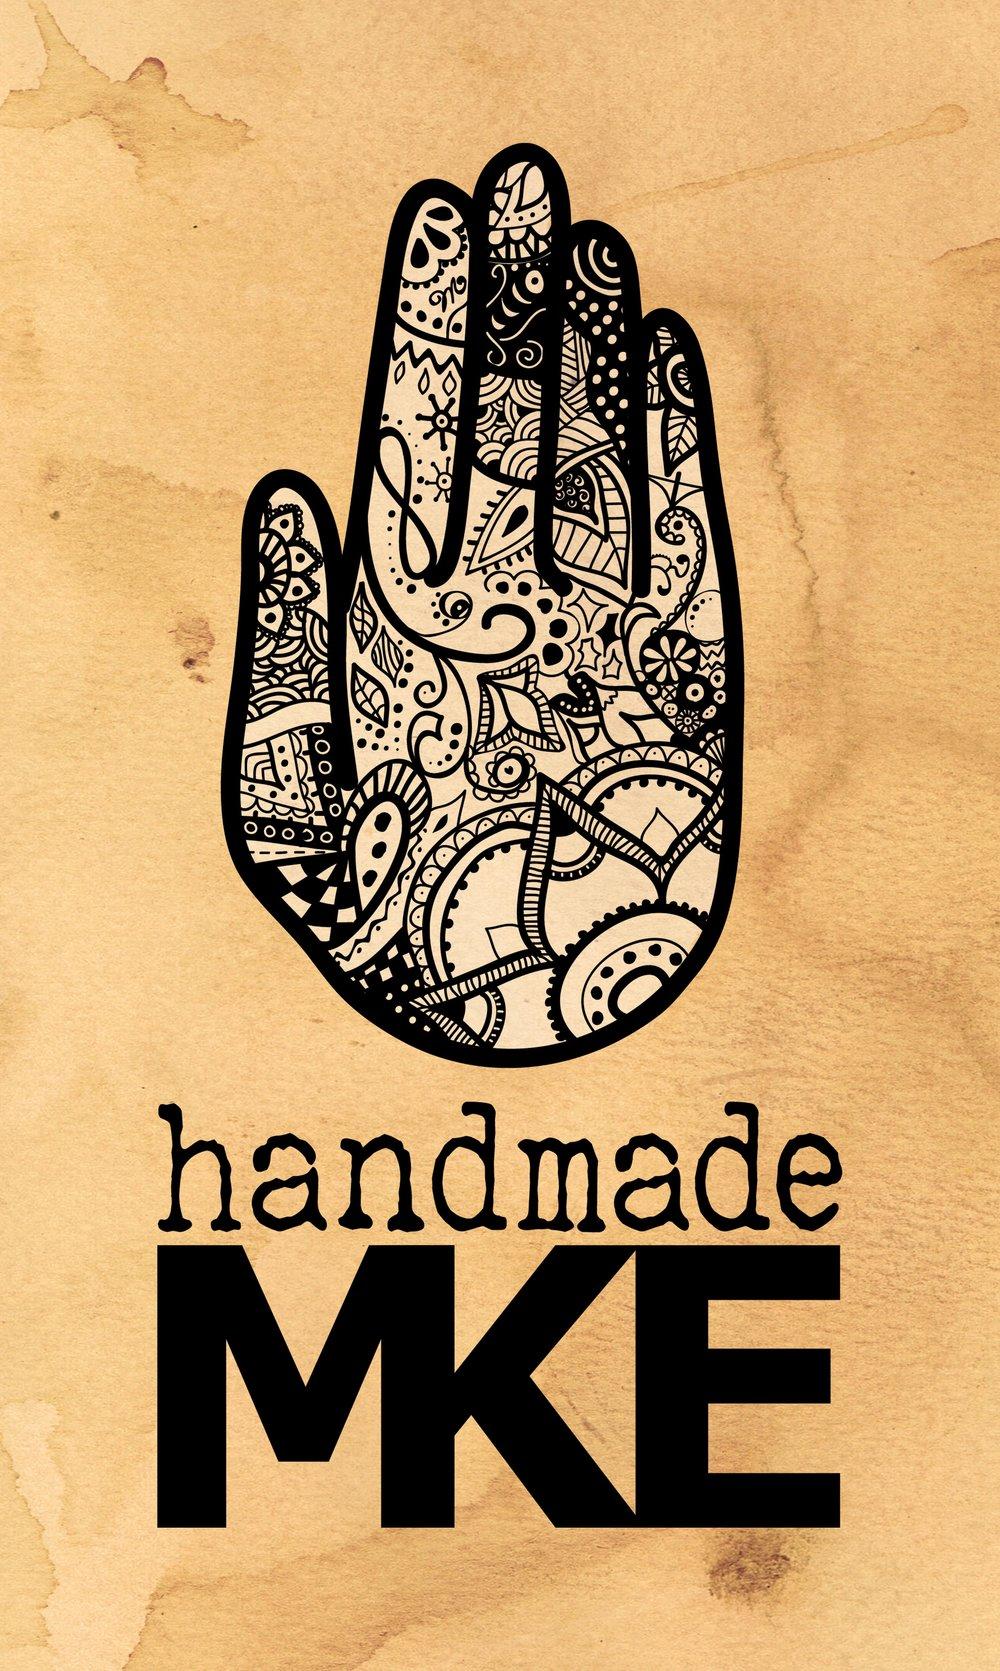 handmadeMKE_01_C.jpg